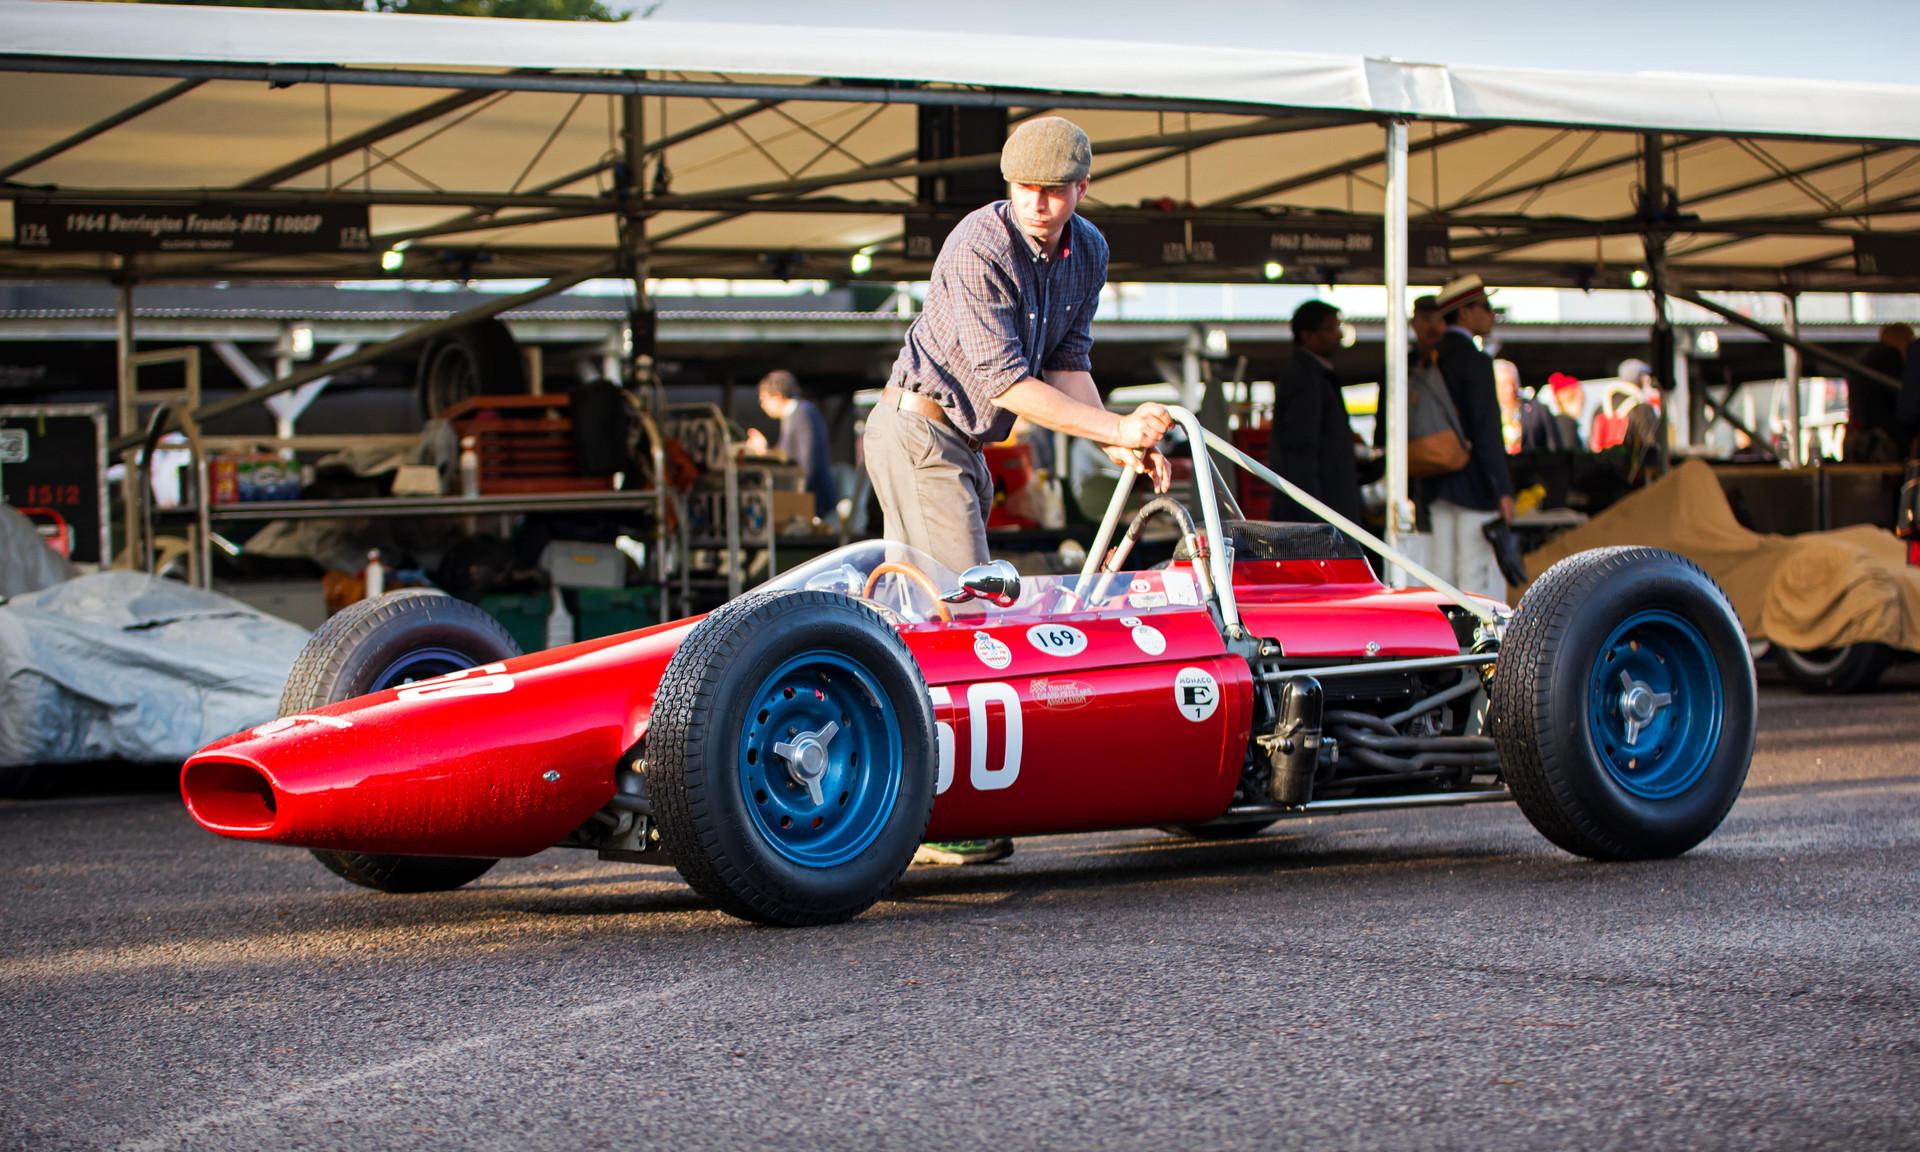 Jason Wright's 1964 Derrington Francis ATS-GP at the 2017 Goodwood Revival